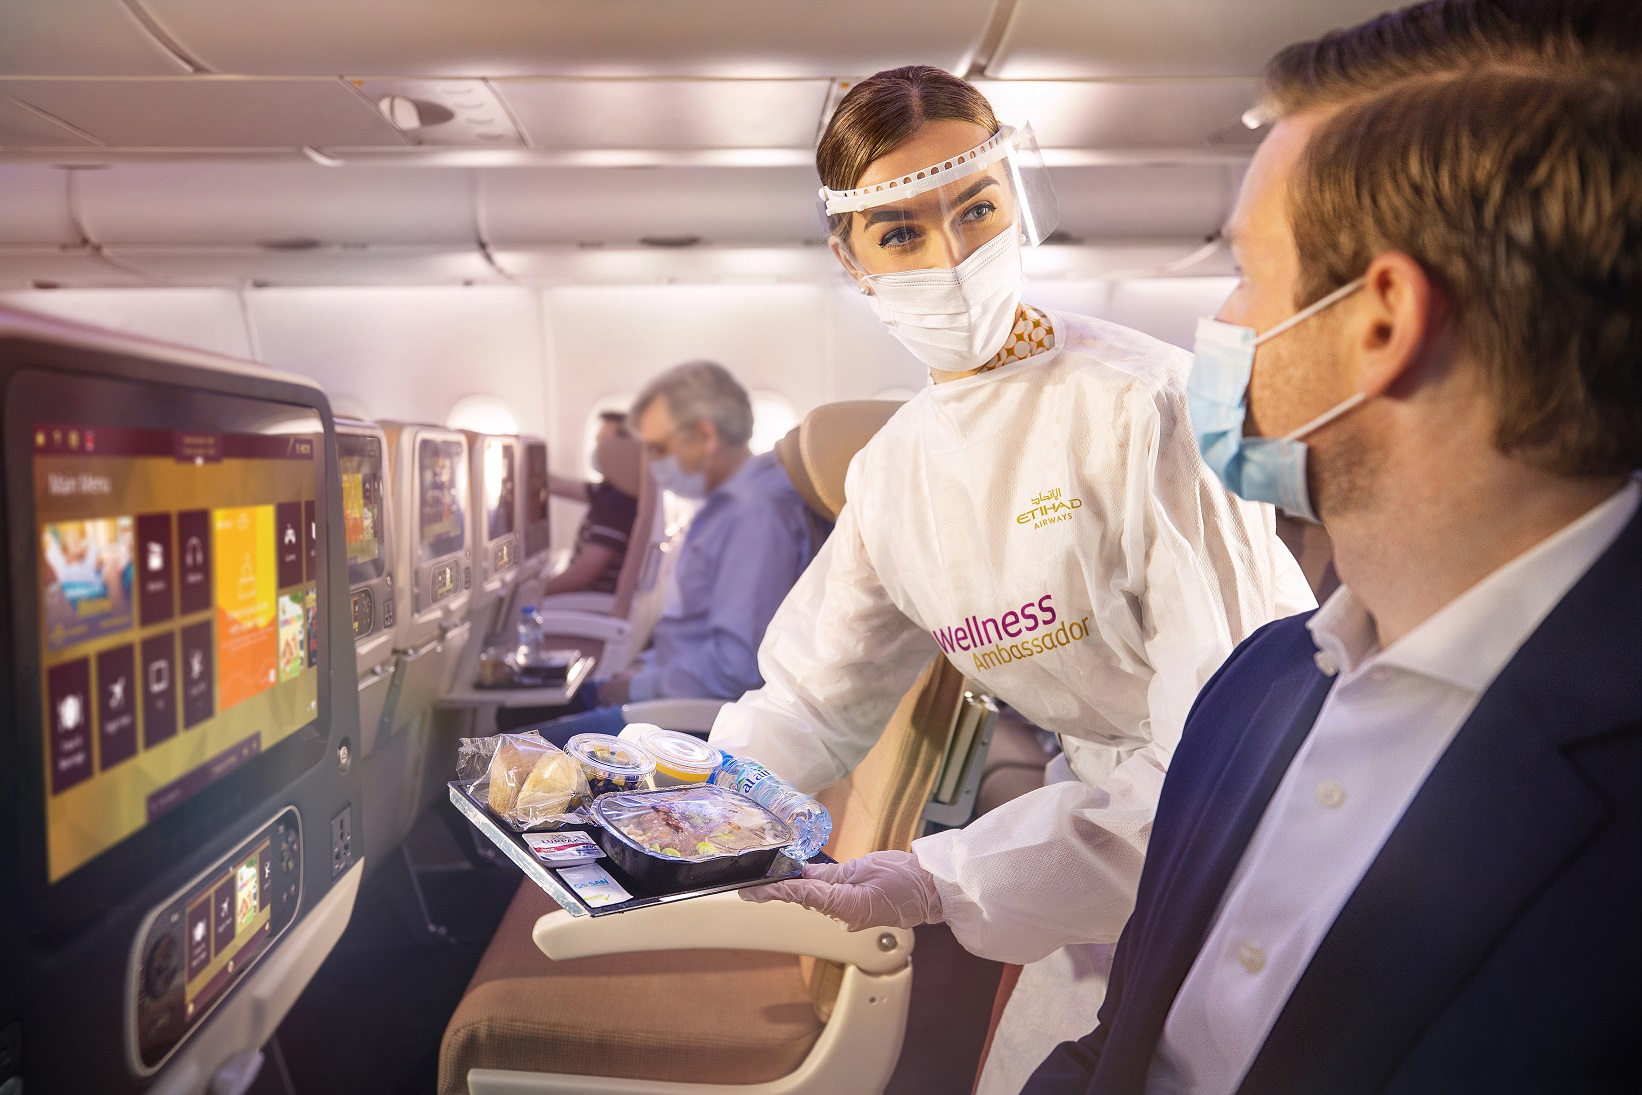 Etihad Airways Wellness Ambassador food service in Economy LR